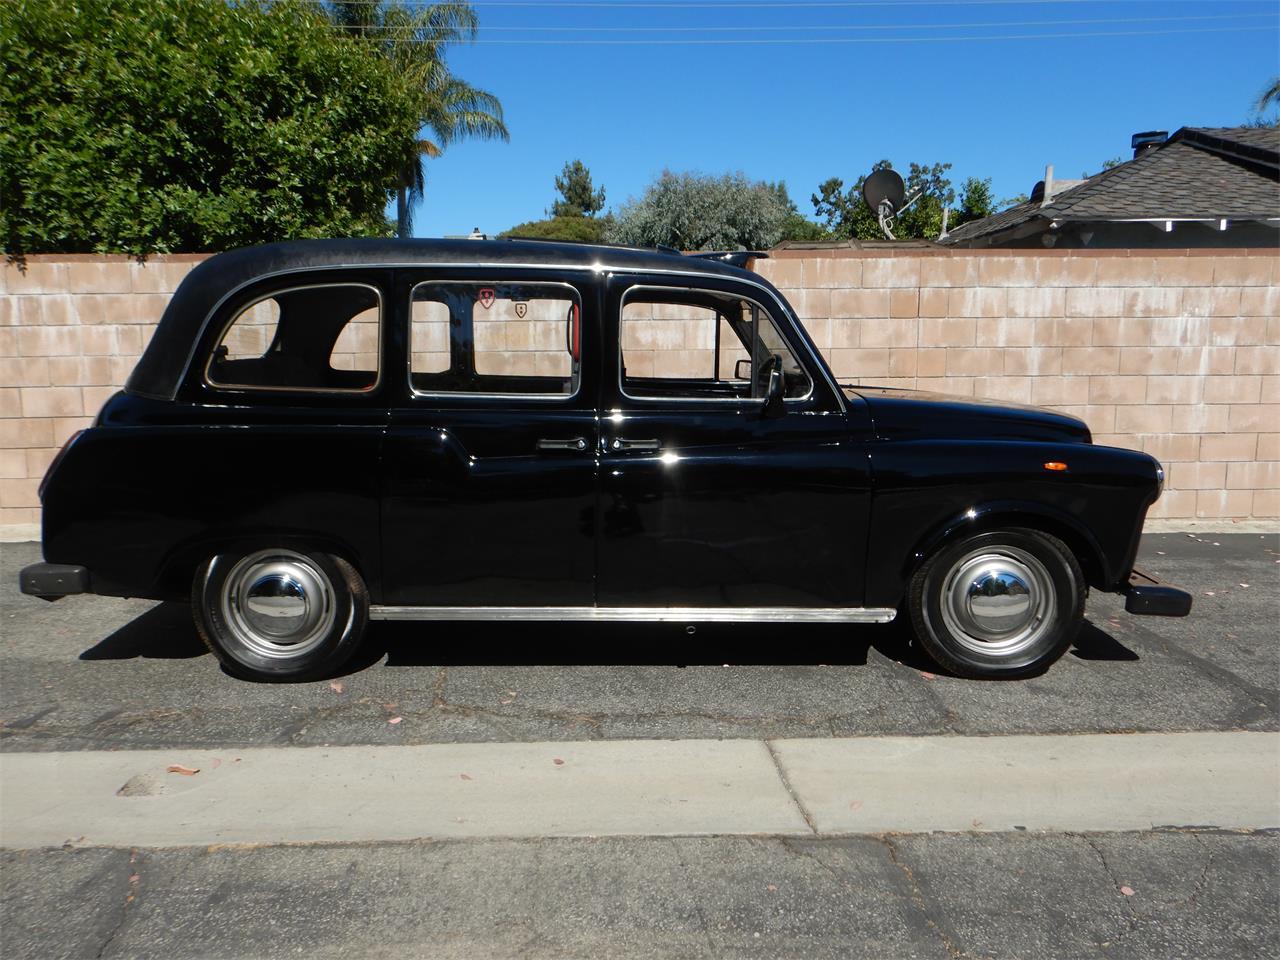 1976 Austin FX4 Taxi Cab (CC-1367085) for sale in woodland hills, California